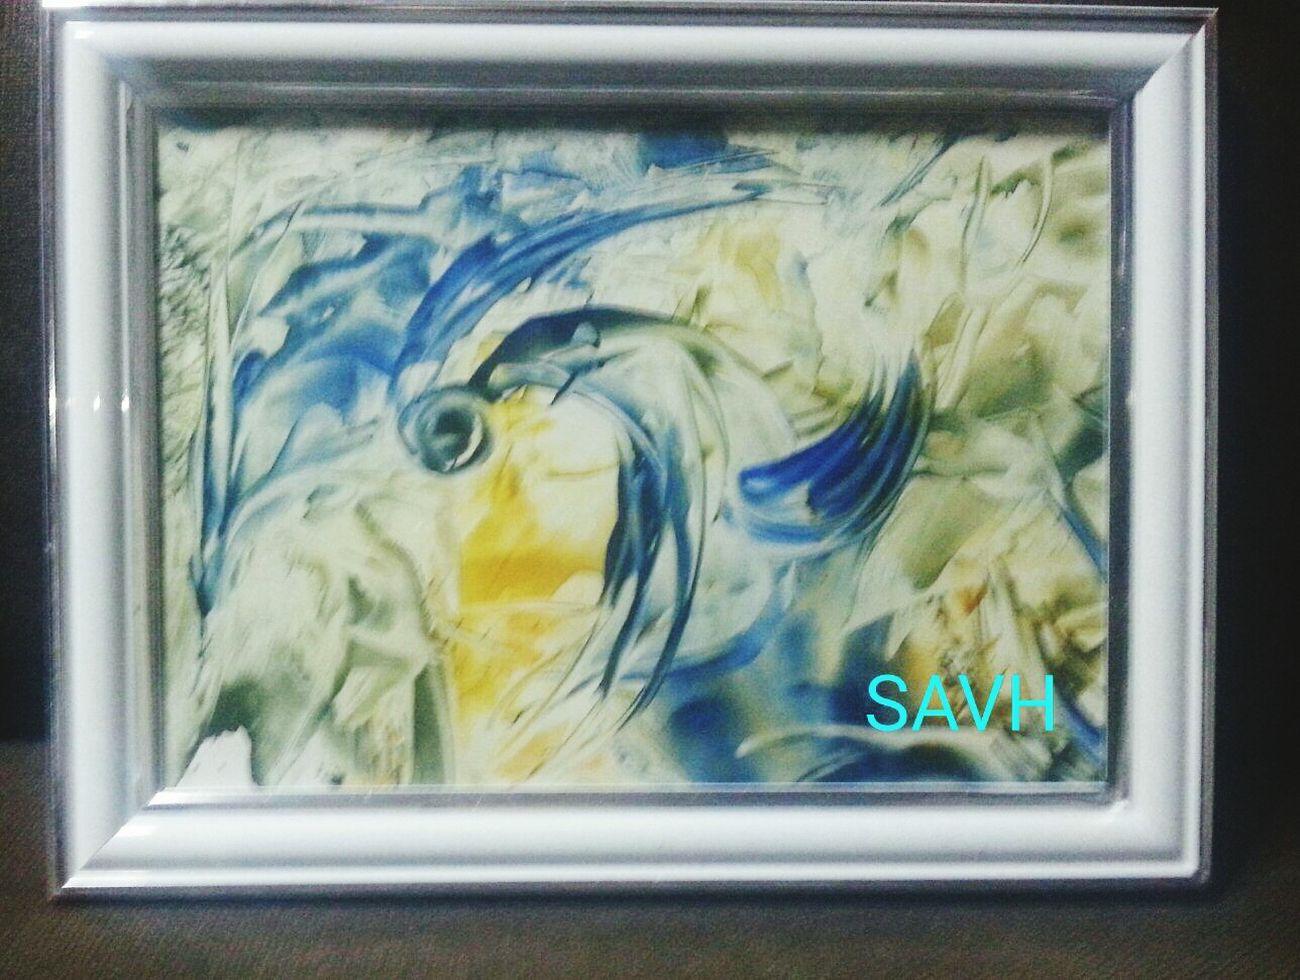 Dauphin Encaustic My Art, My Soul... Painting Paint Spiritual Artworks Bleu Water Healingenergy Nature Animal Planet Spiritualguidence My Art ArtWork My Artistic Style Art Gallery Intuitive Art Intuitive Appearance Appearance Art, Drawing, Creativity ArtWork